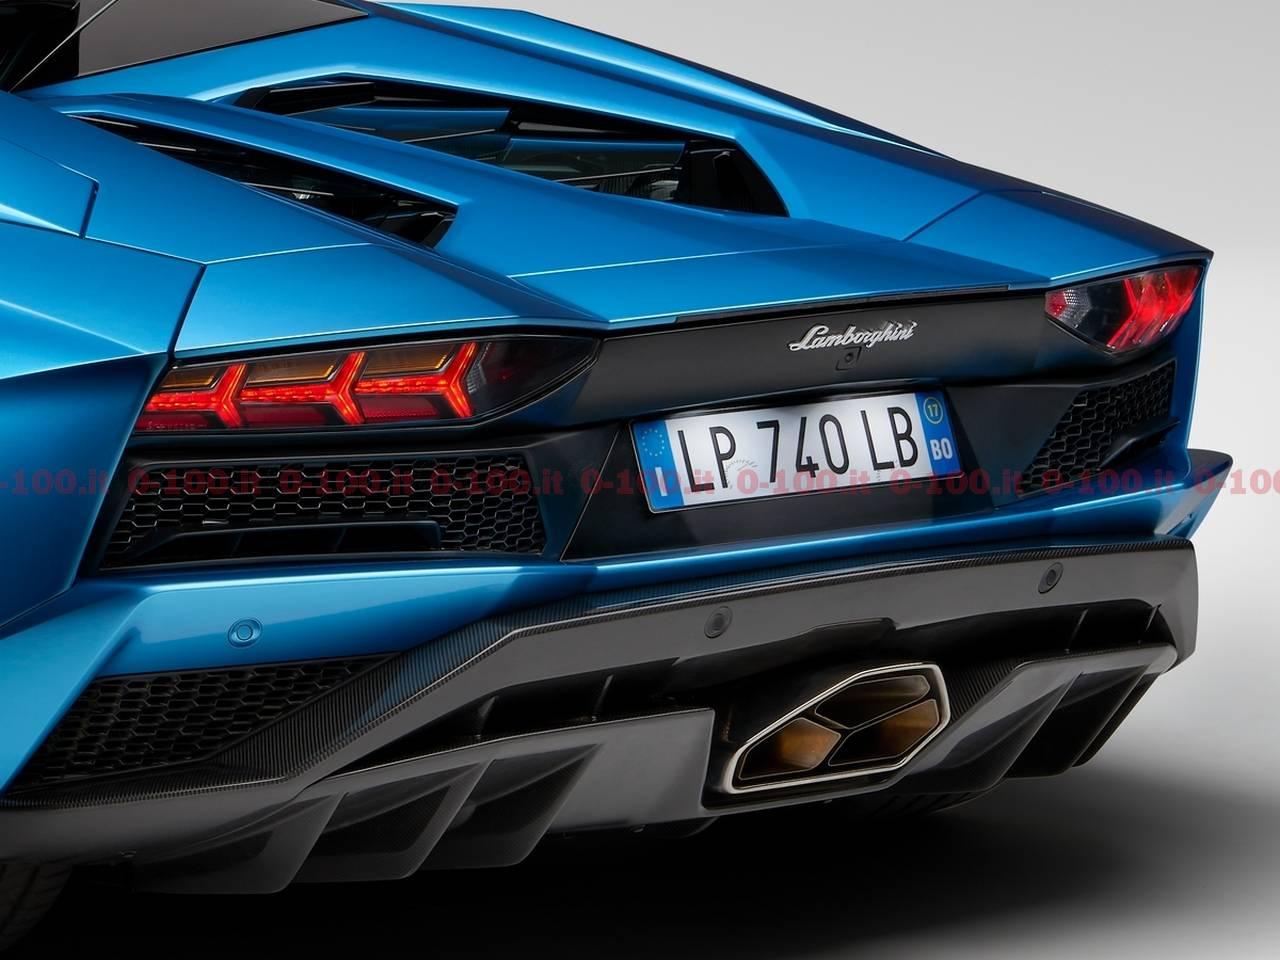 Lamborghini_Aventador_S_Roadster_0-100_20